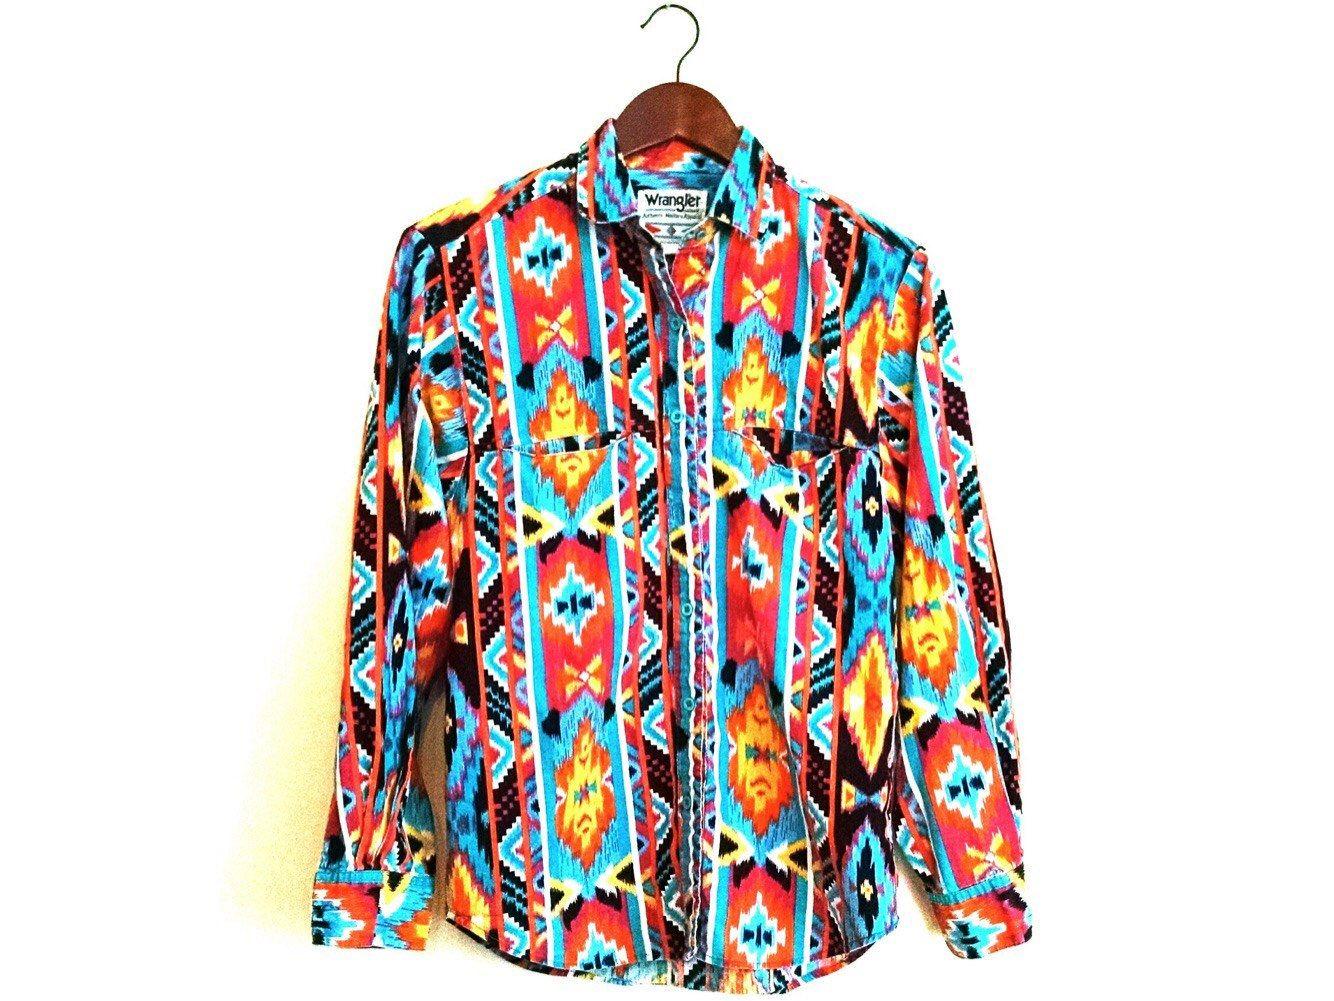 Wrangler Patch NFR Bullriding Rodeo for vest jacket shirt jeans cowboy Denim